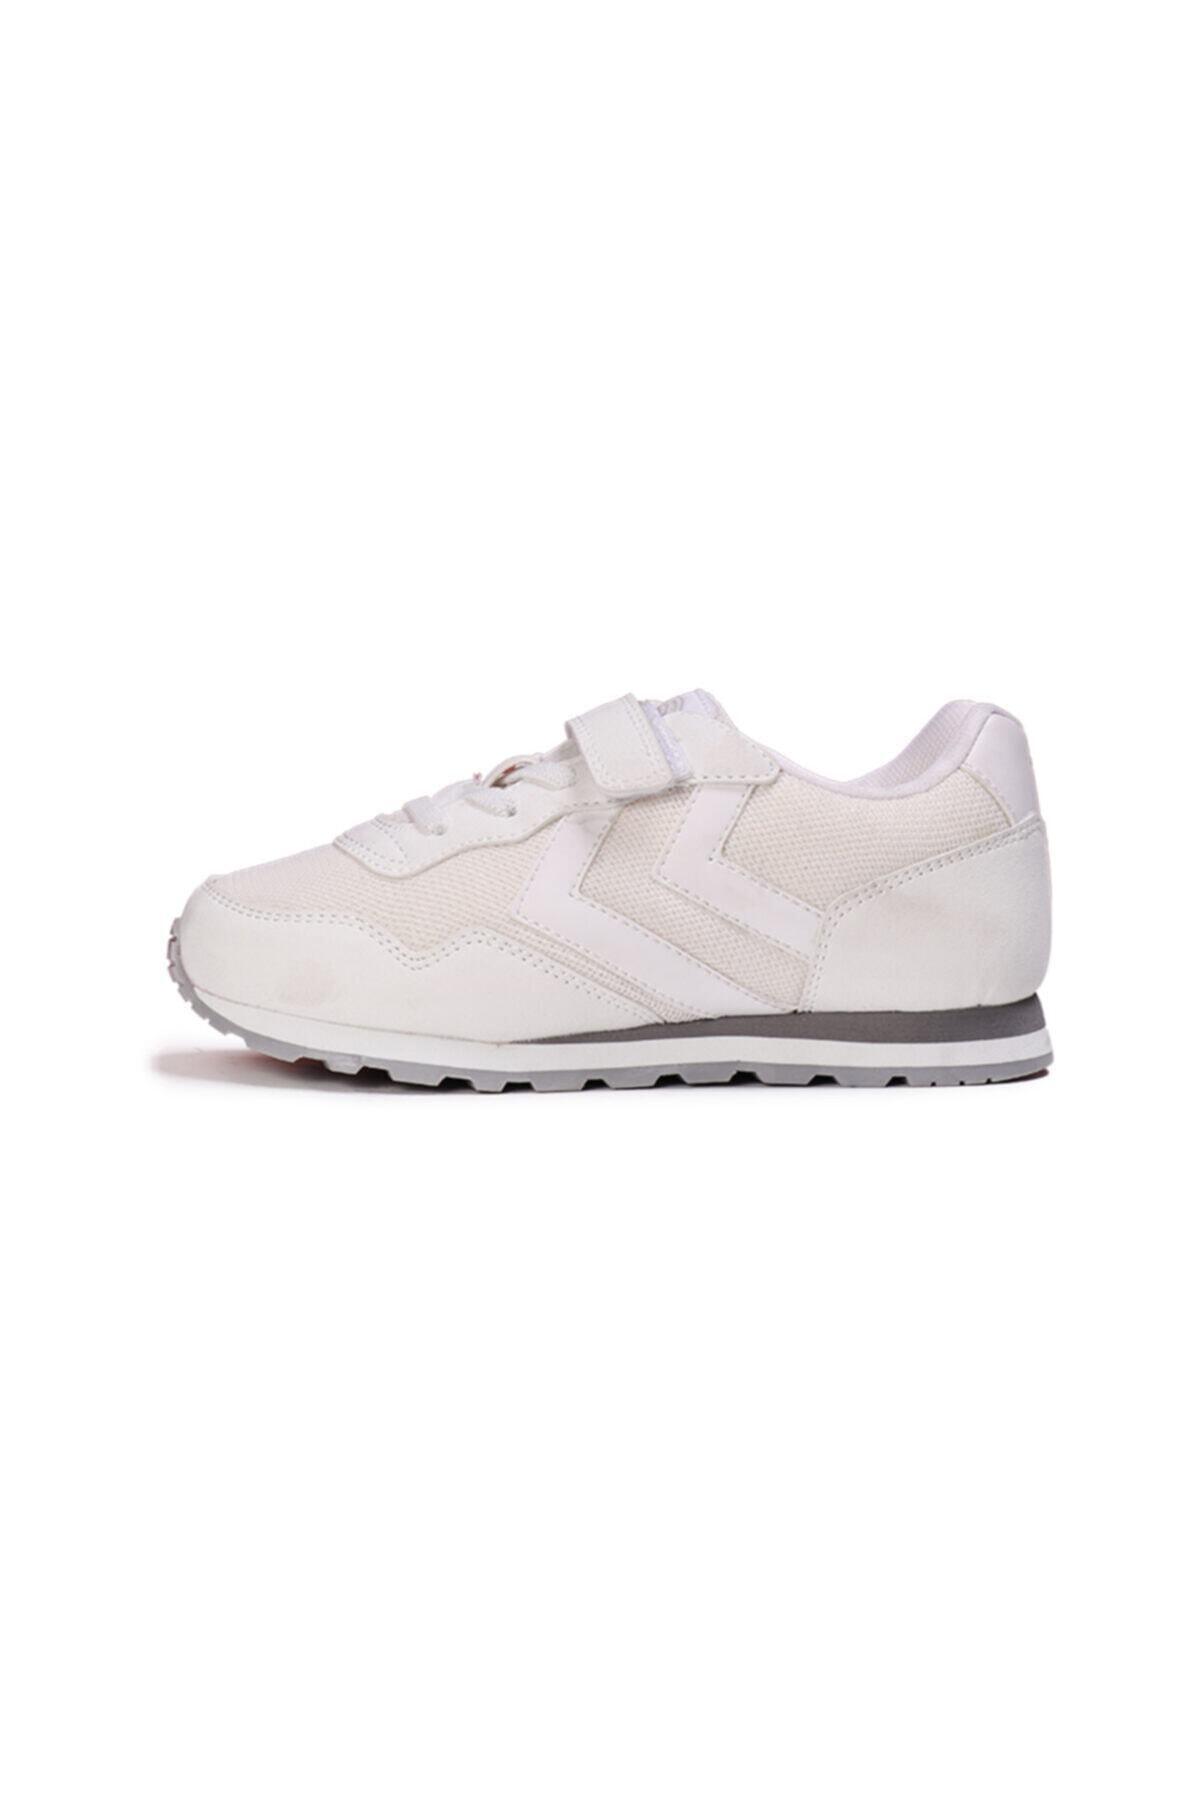 HUMMEL KIDS Hummel Thor Jr Lıfestyle Shoes 1